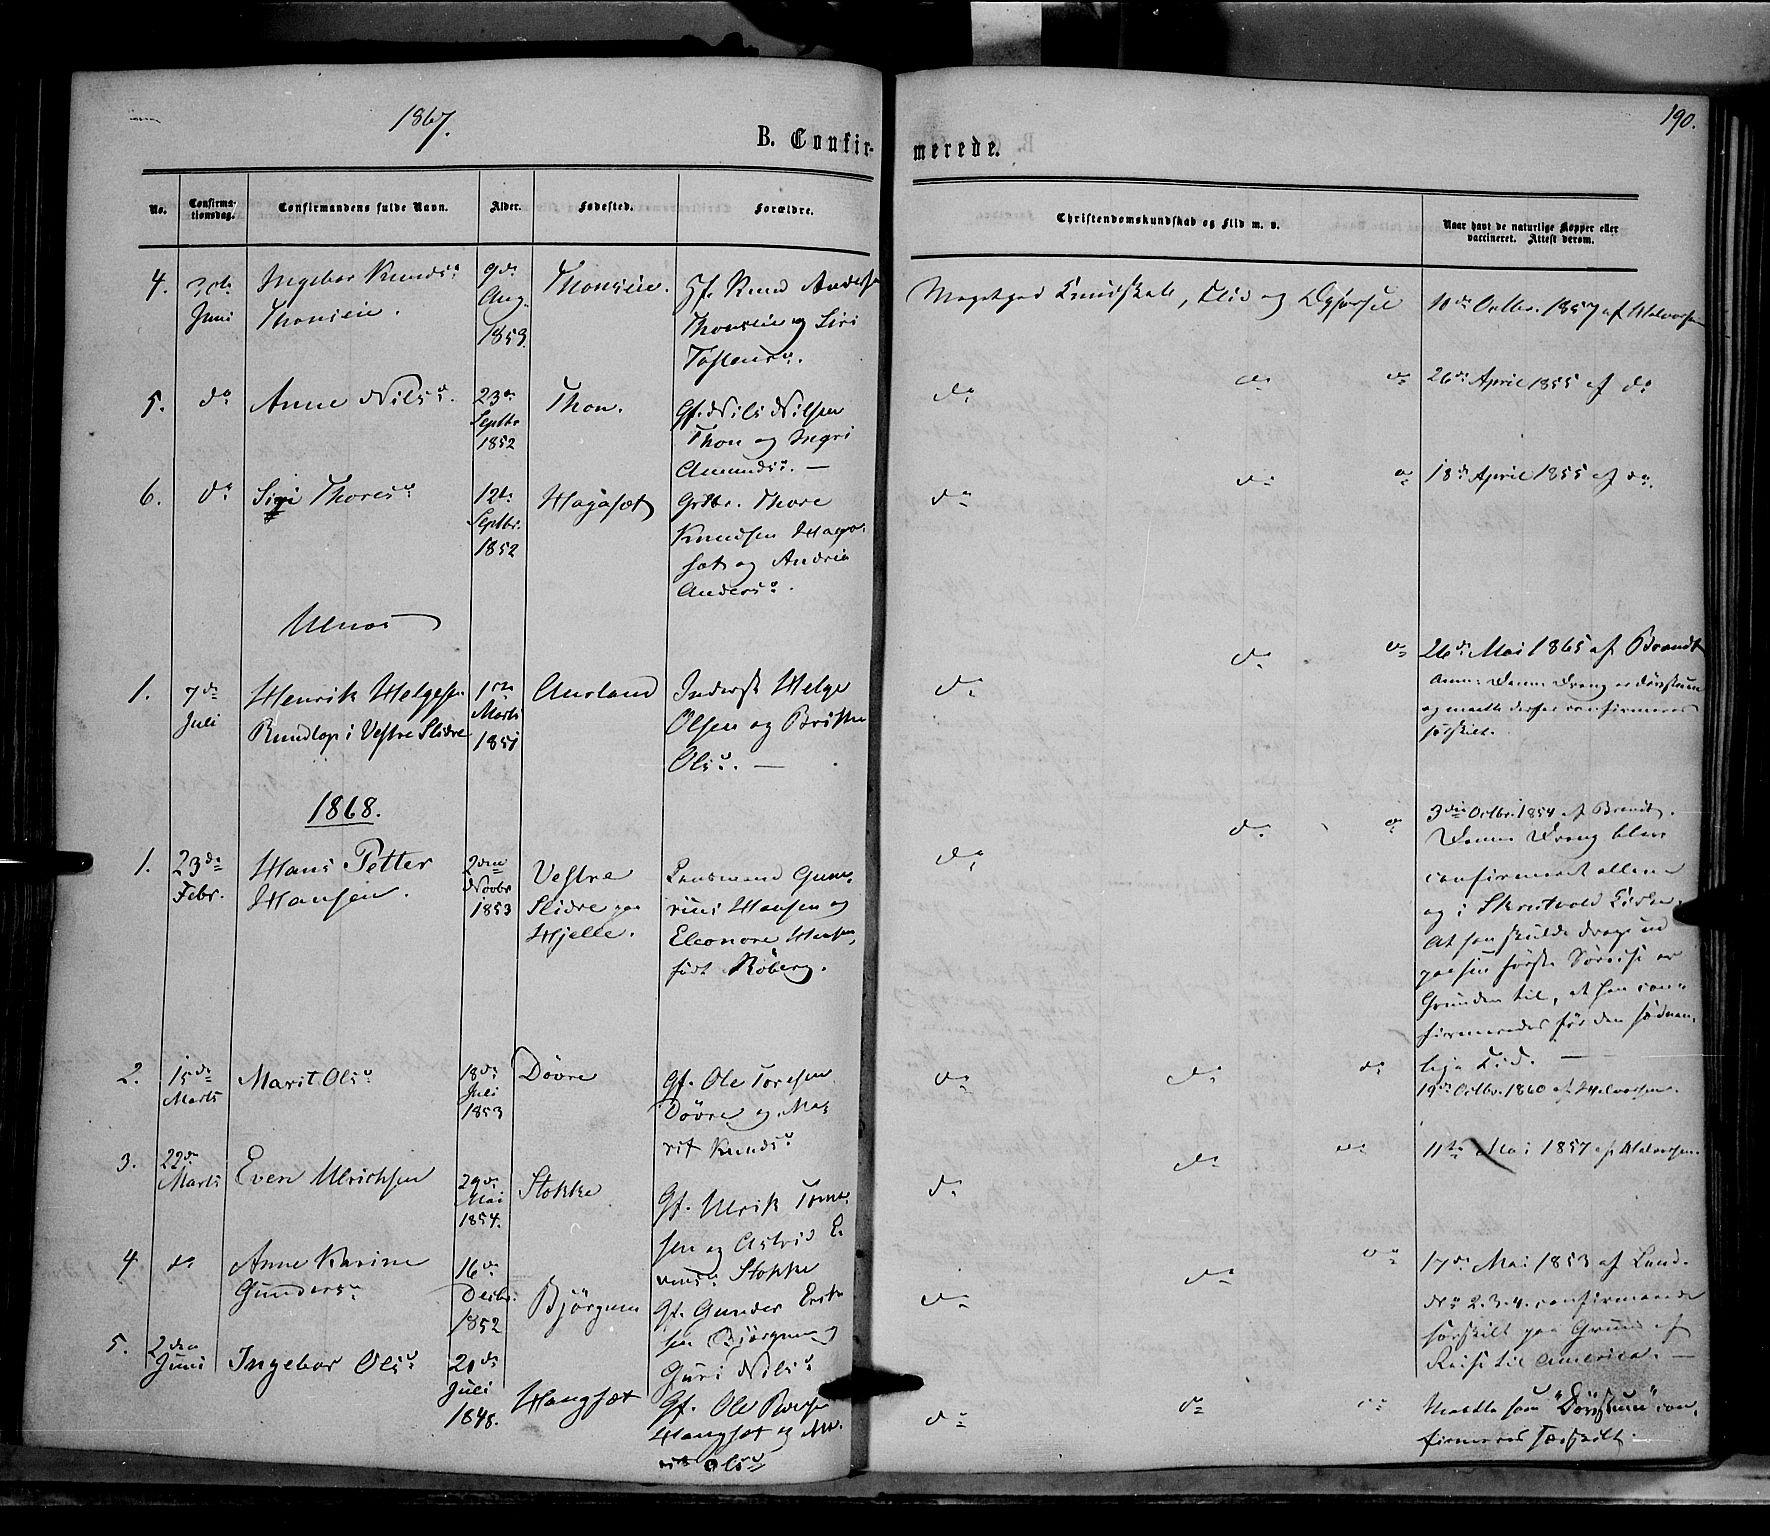 SAH, Nord-Aurdal prestekontor, Ministerialbok nr. 8, 1863-1875, s. 190